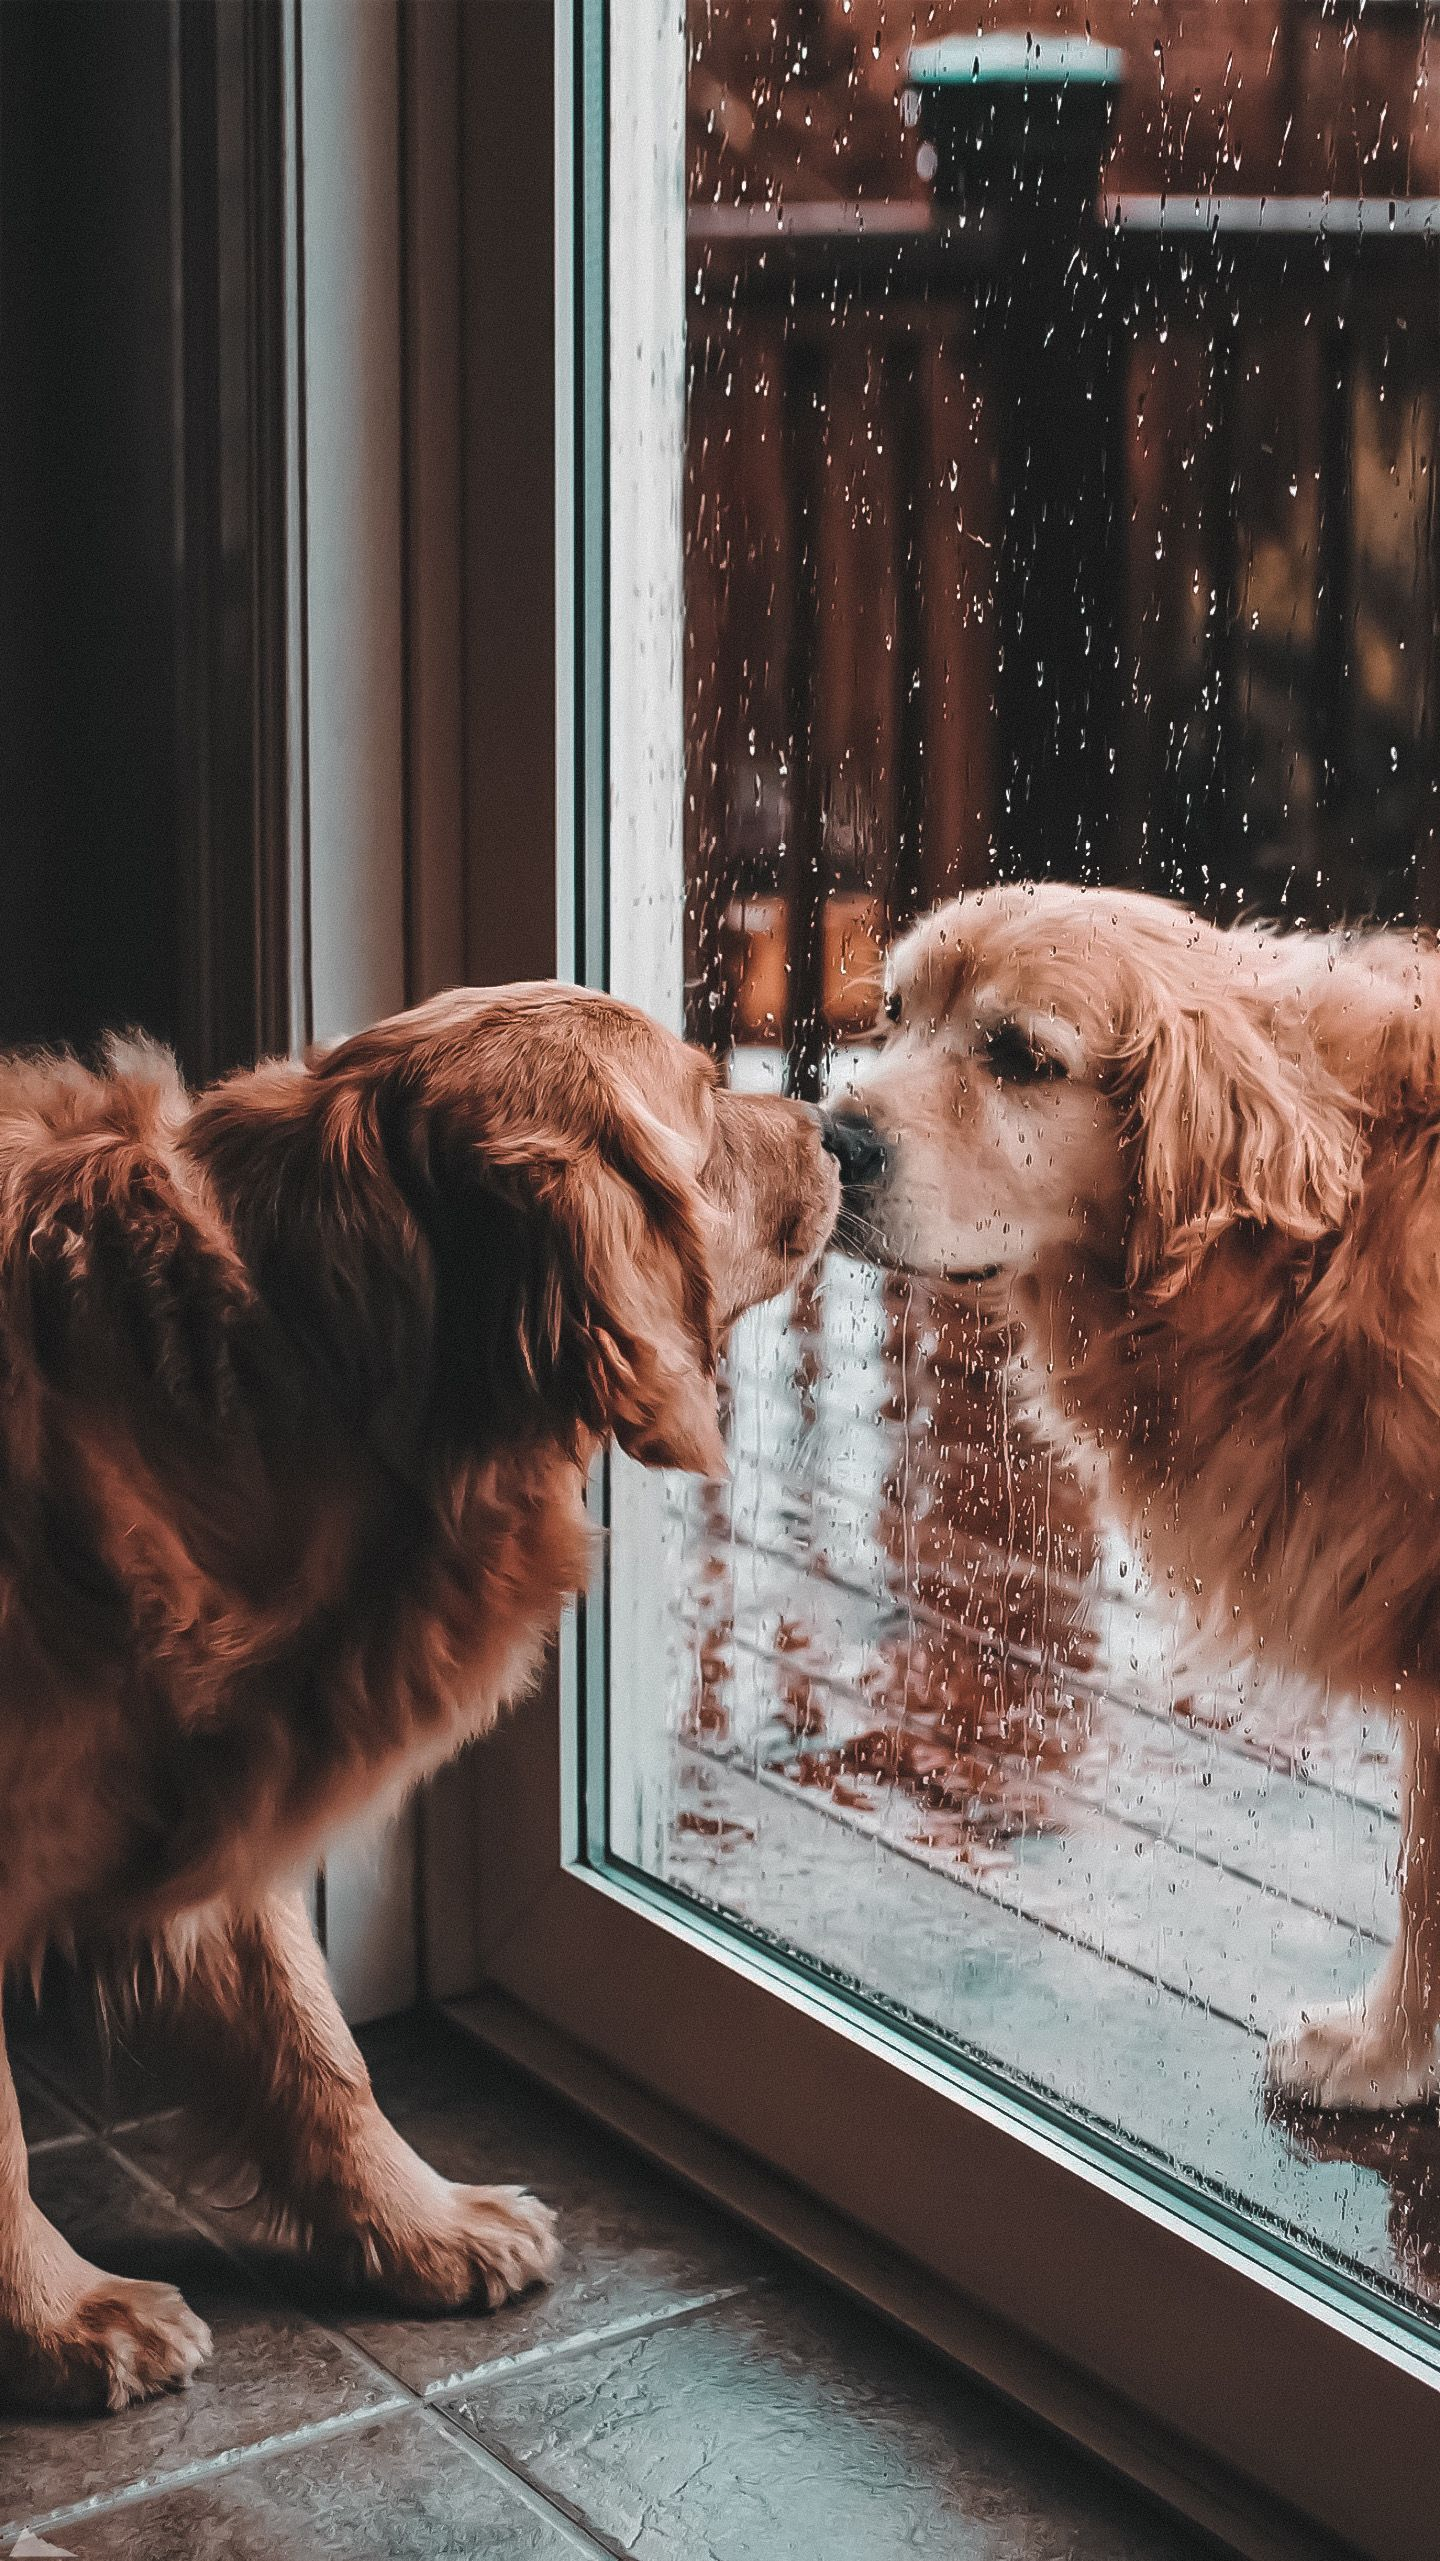 Pin By Andrada Andra On Oboi Dlya Telefona Cute Dog Wallpaper Cute Animals Cute Dogs And Puppies